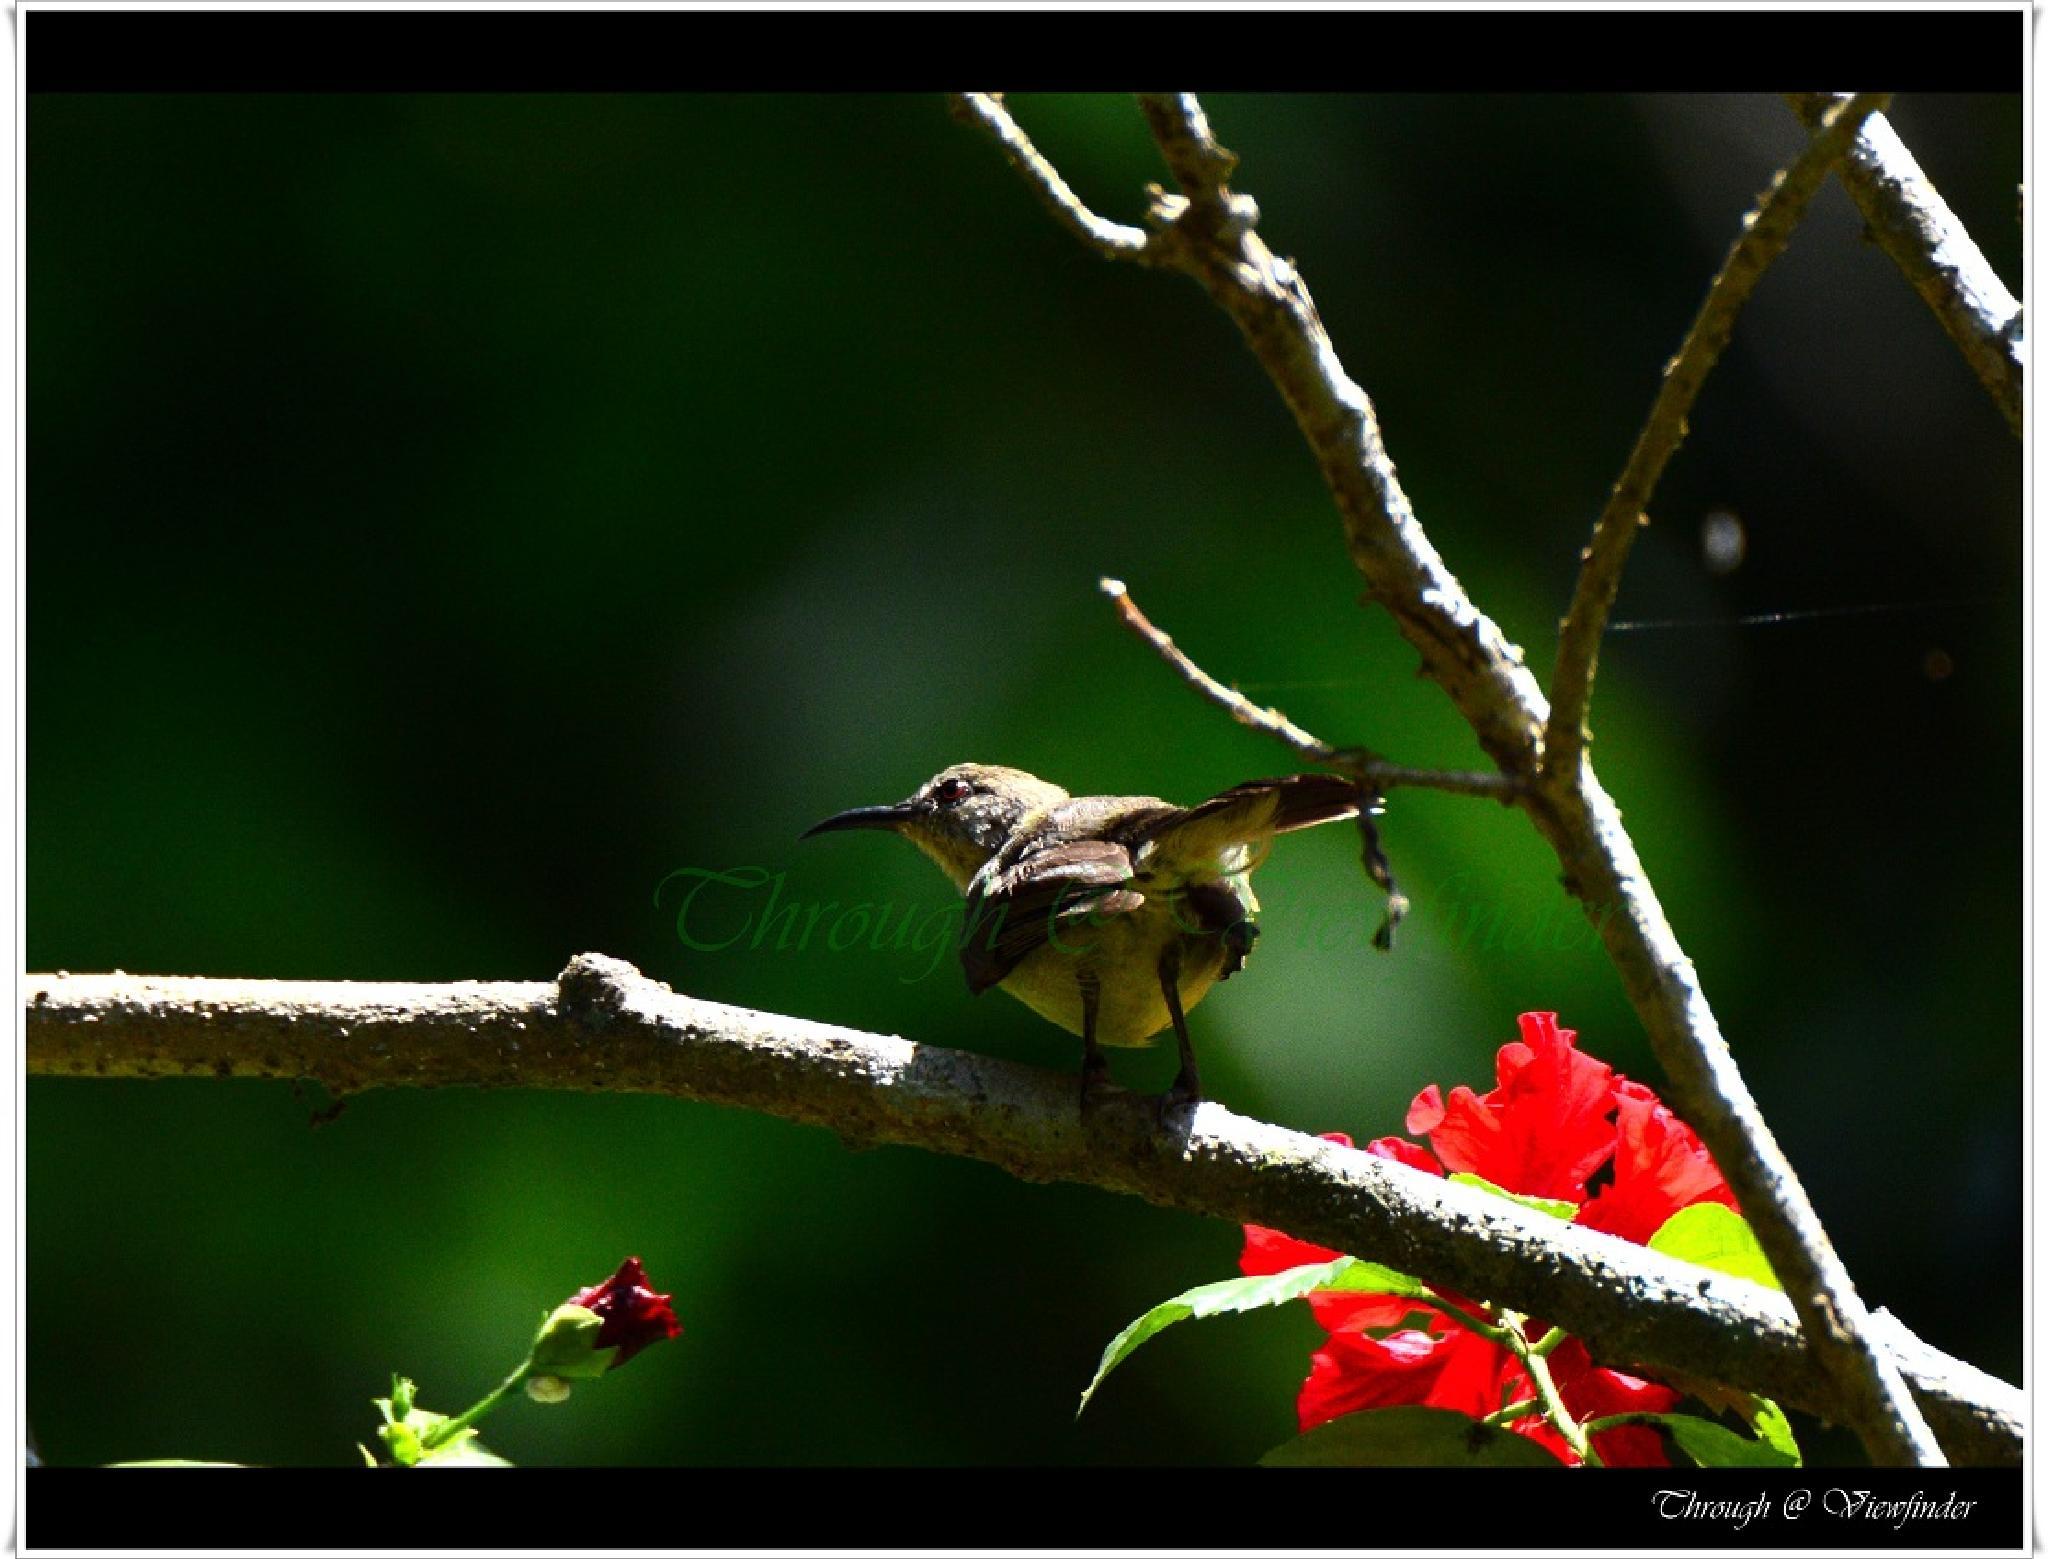 Sun Bird by prashobh.ailyam